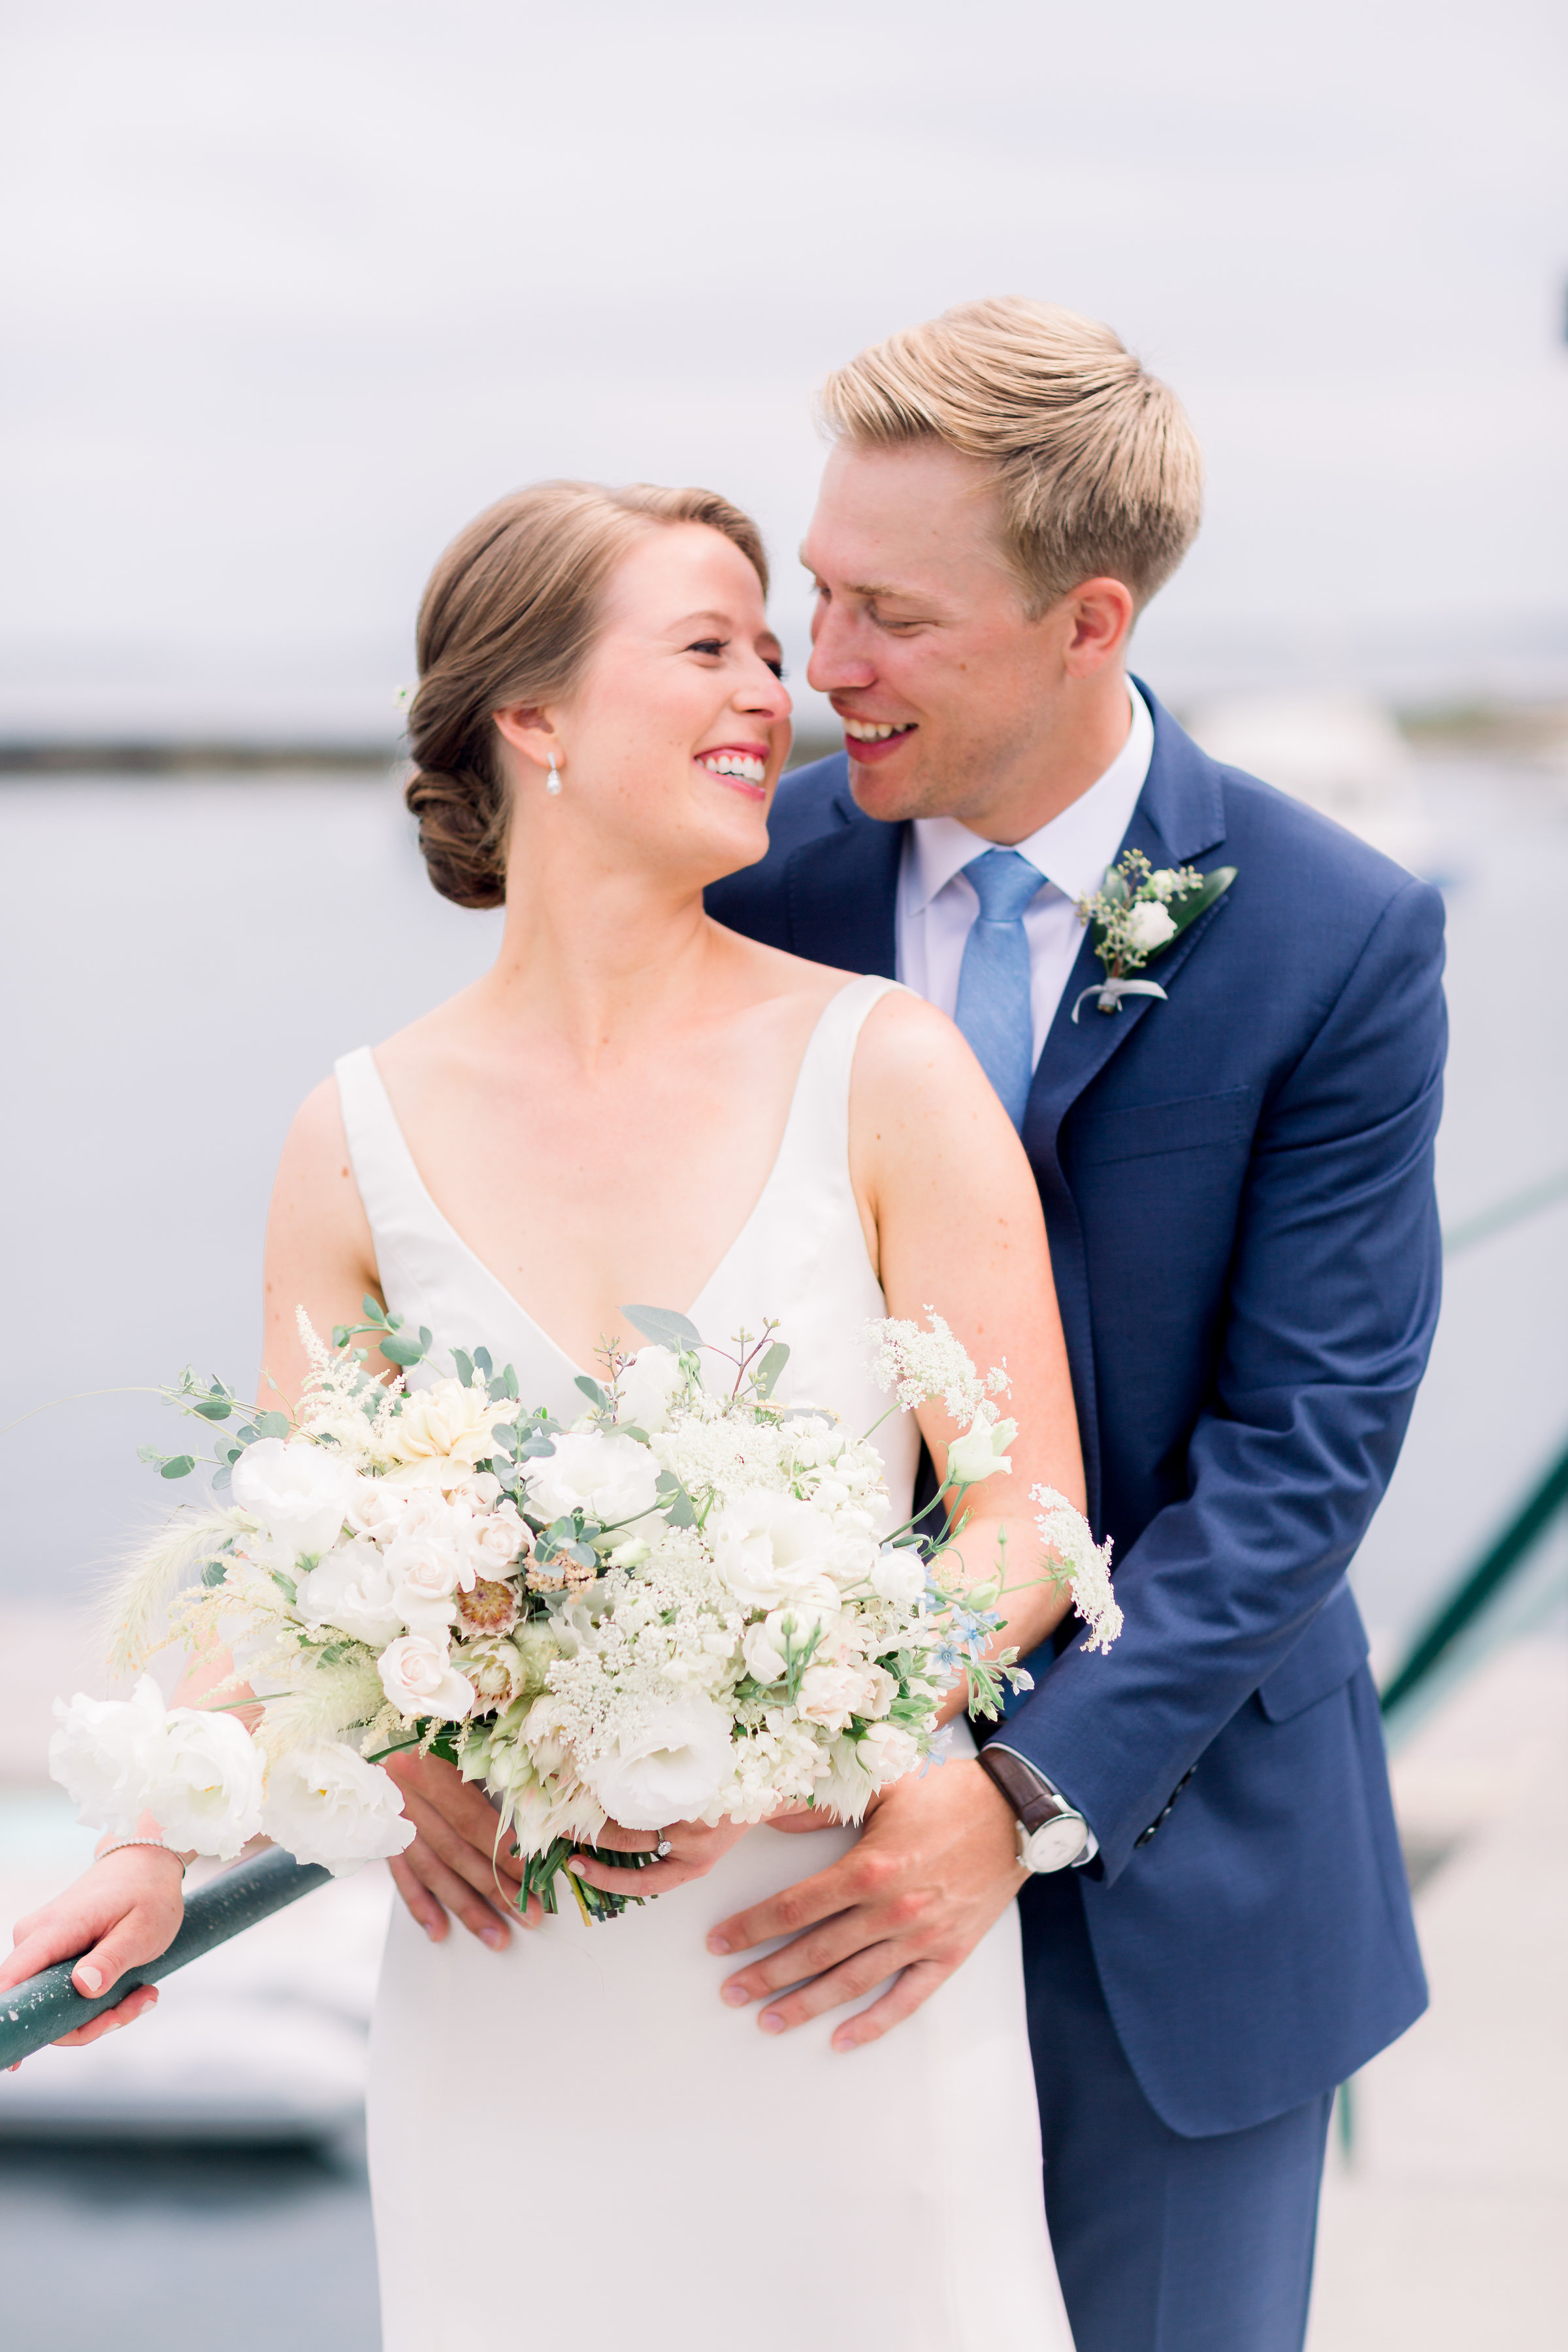 Watershed_Floral_Newagen_Wedding_Maine_5959.jpg